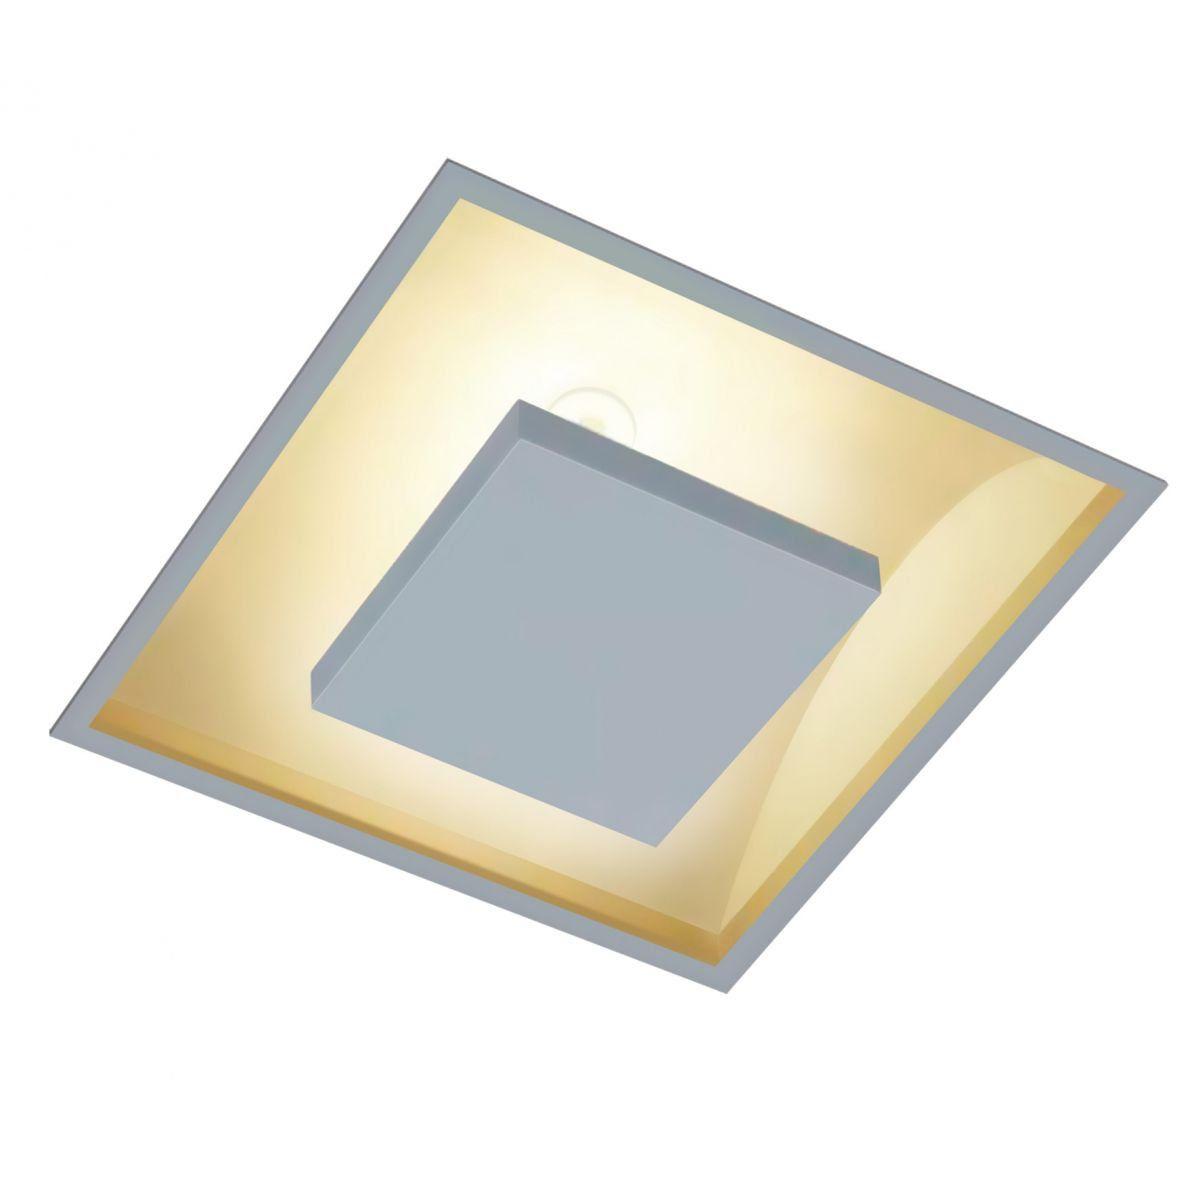 Embutido Quadrado Luz Indireta 35x35 4xG9 Branco